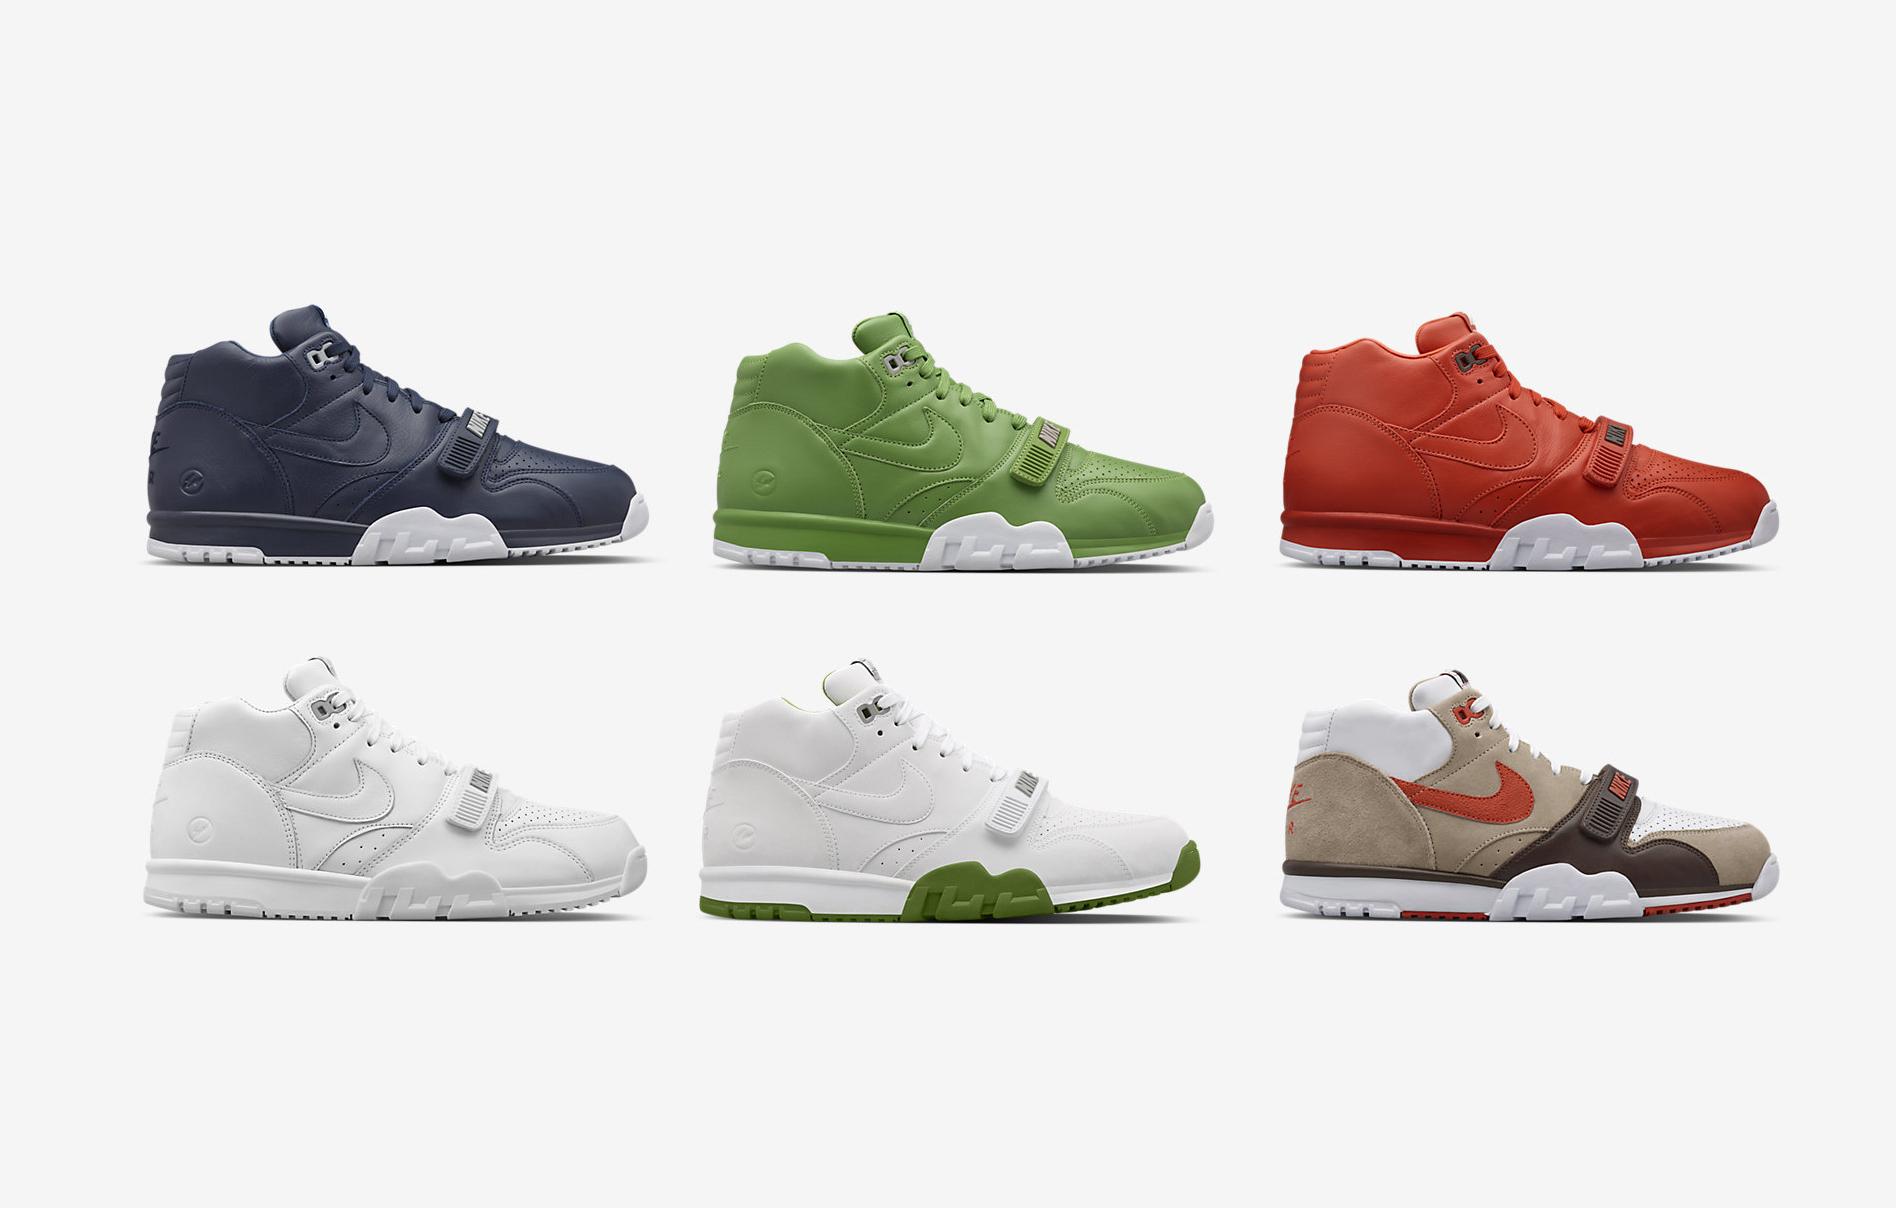 new arrivals 2728d 52215 Fragment x Nike Air Trainer 1 Mid all six